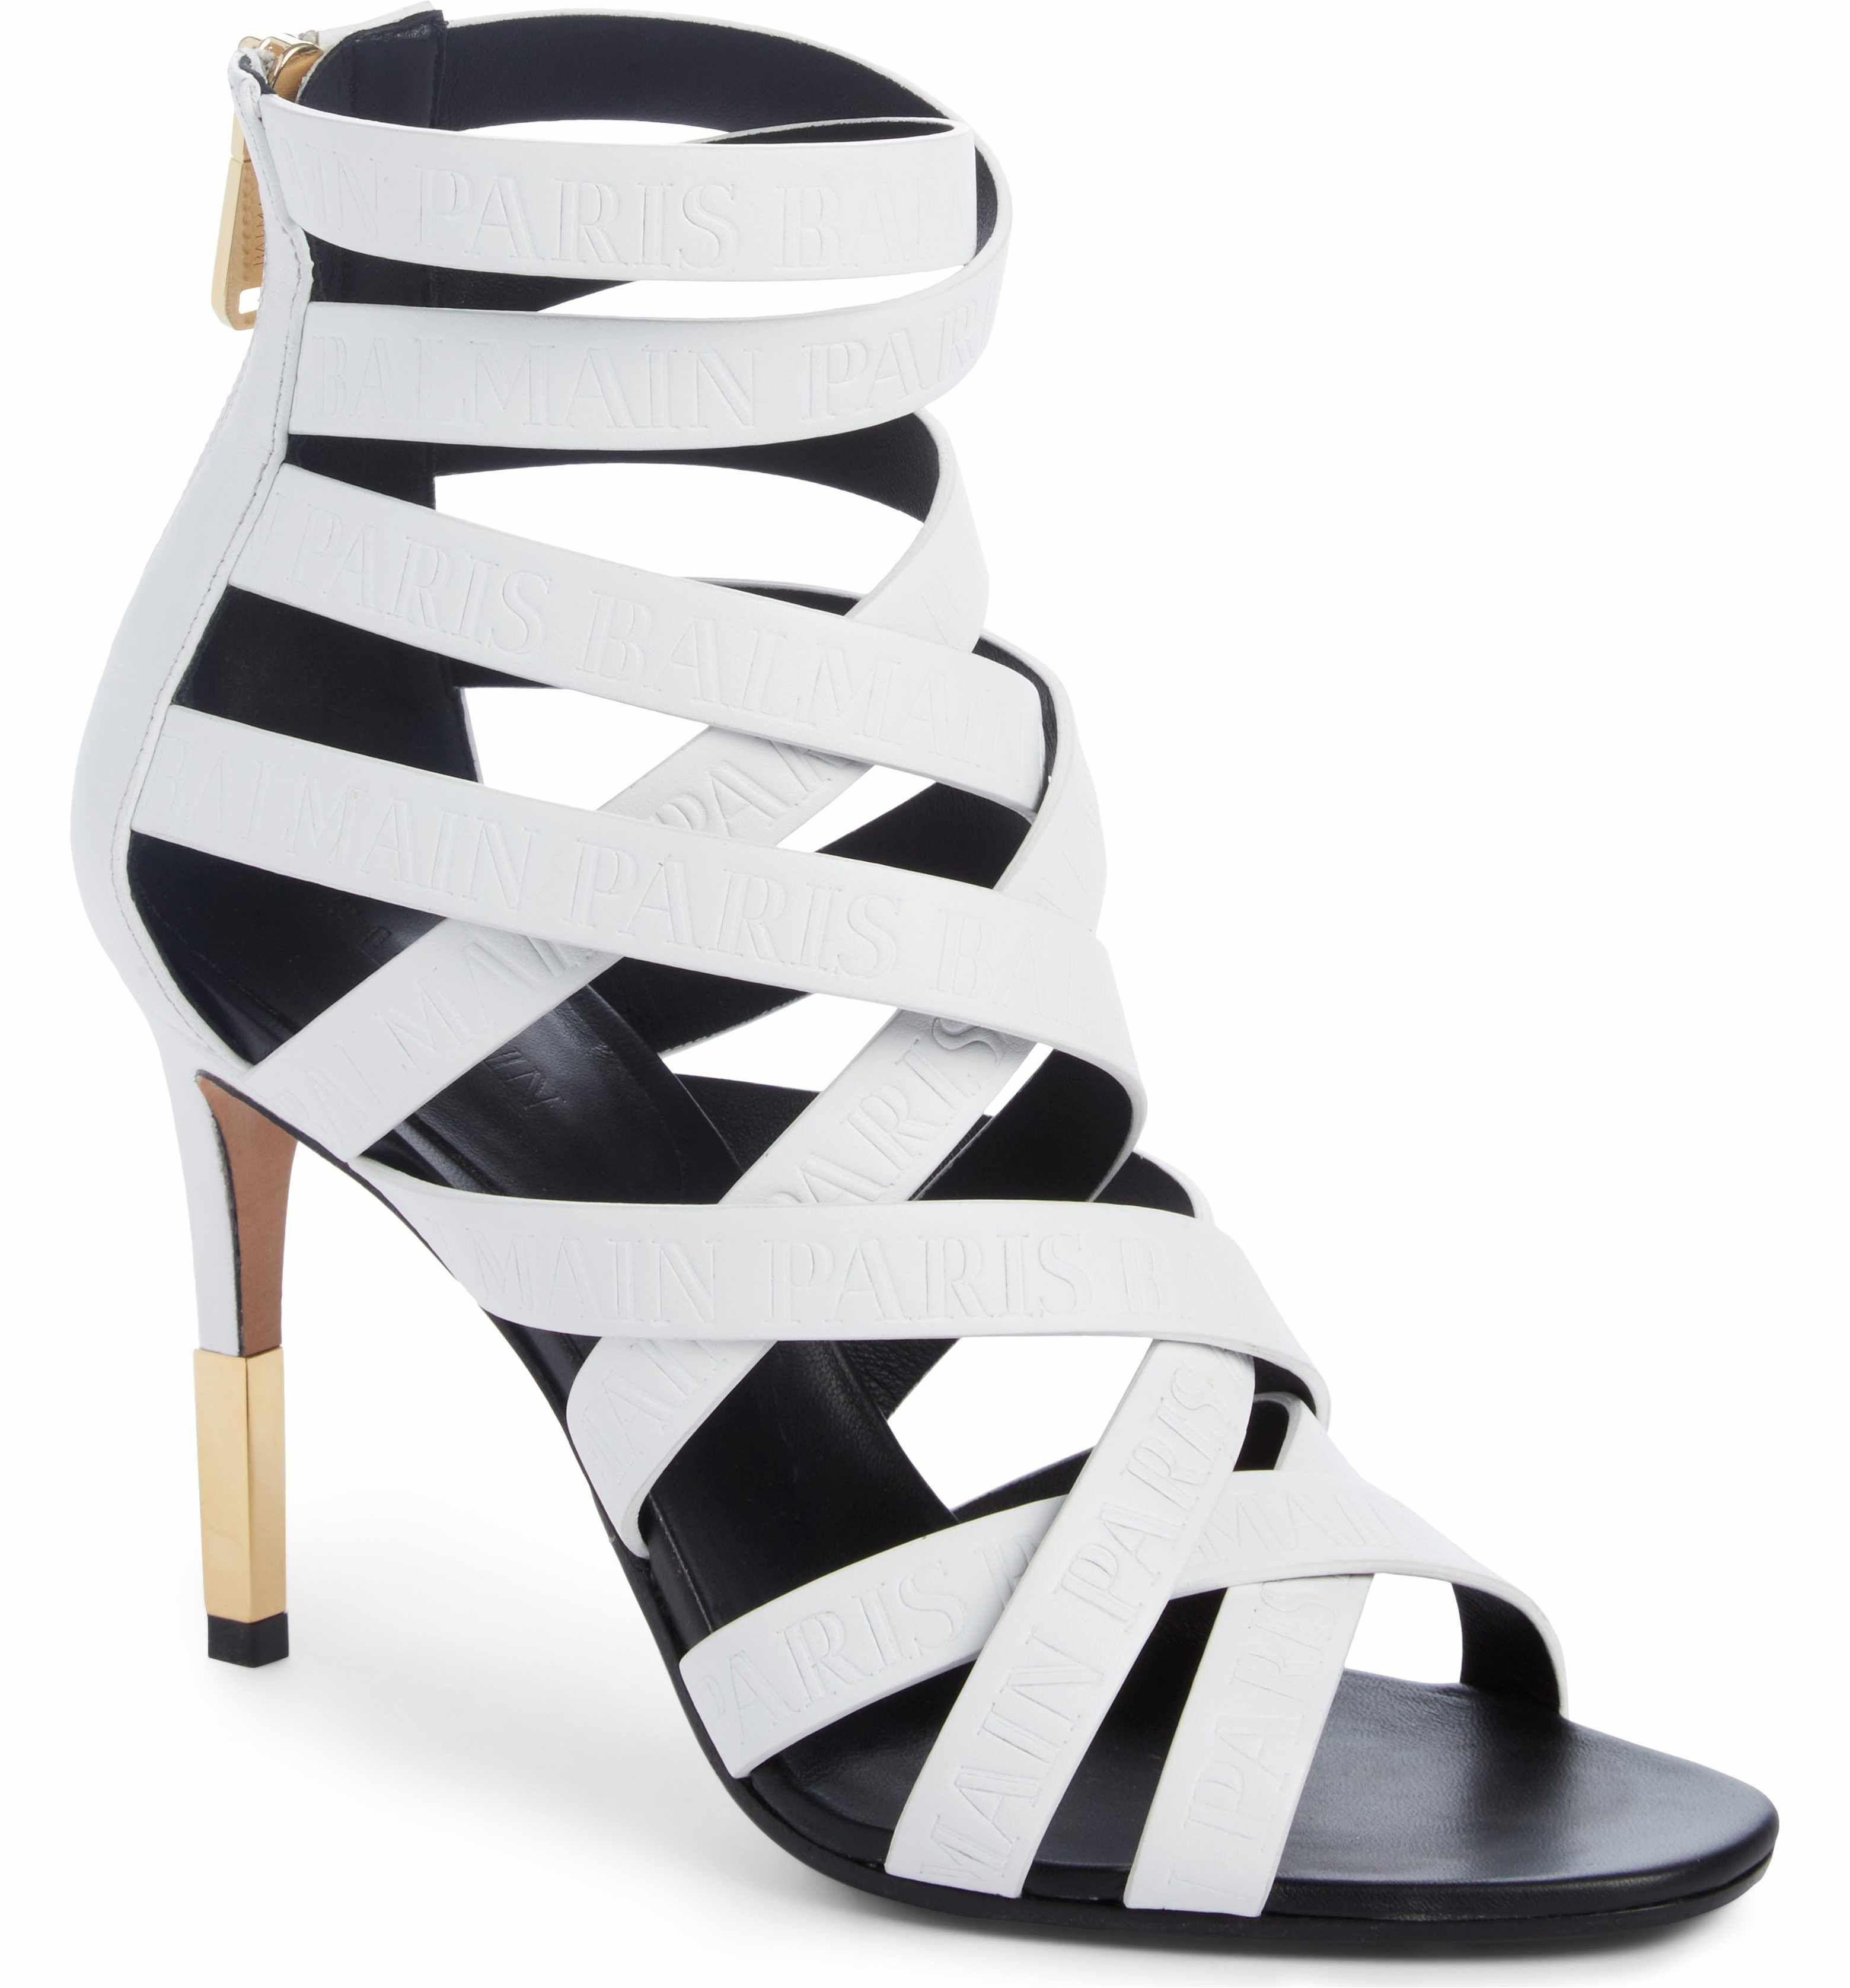 Bridal Shoes At Nordstrom: Balmain Caged Sandal (Women